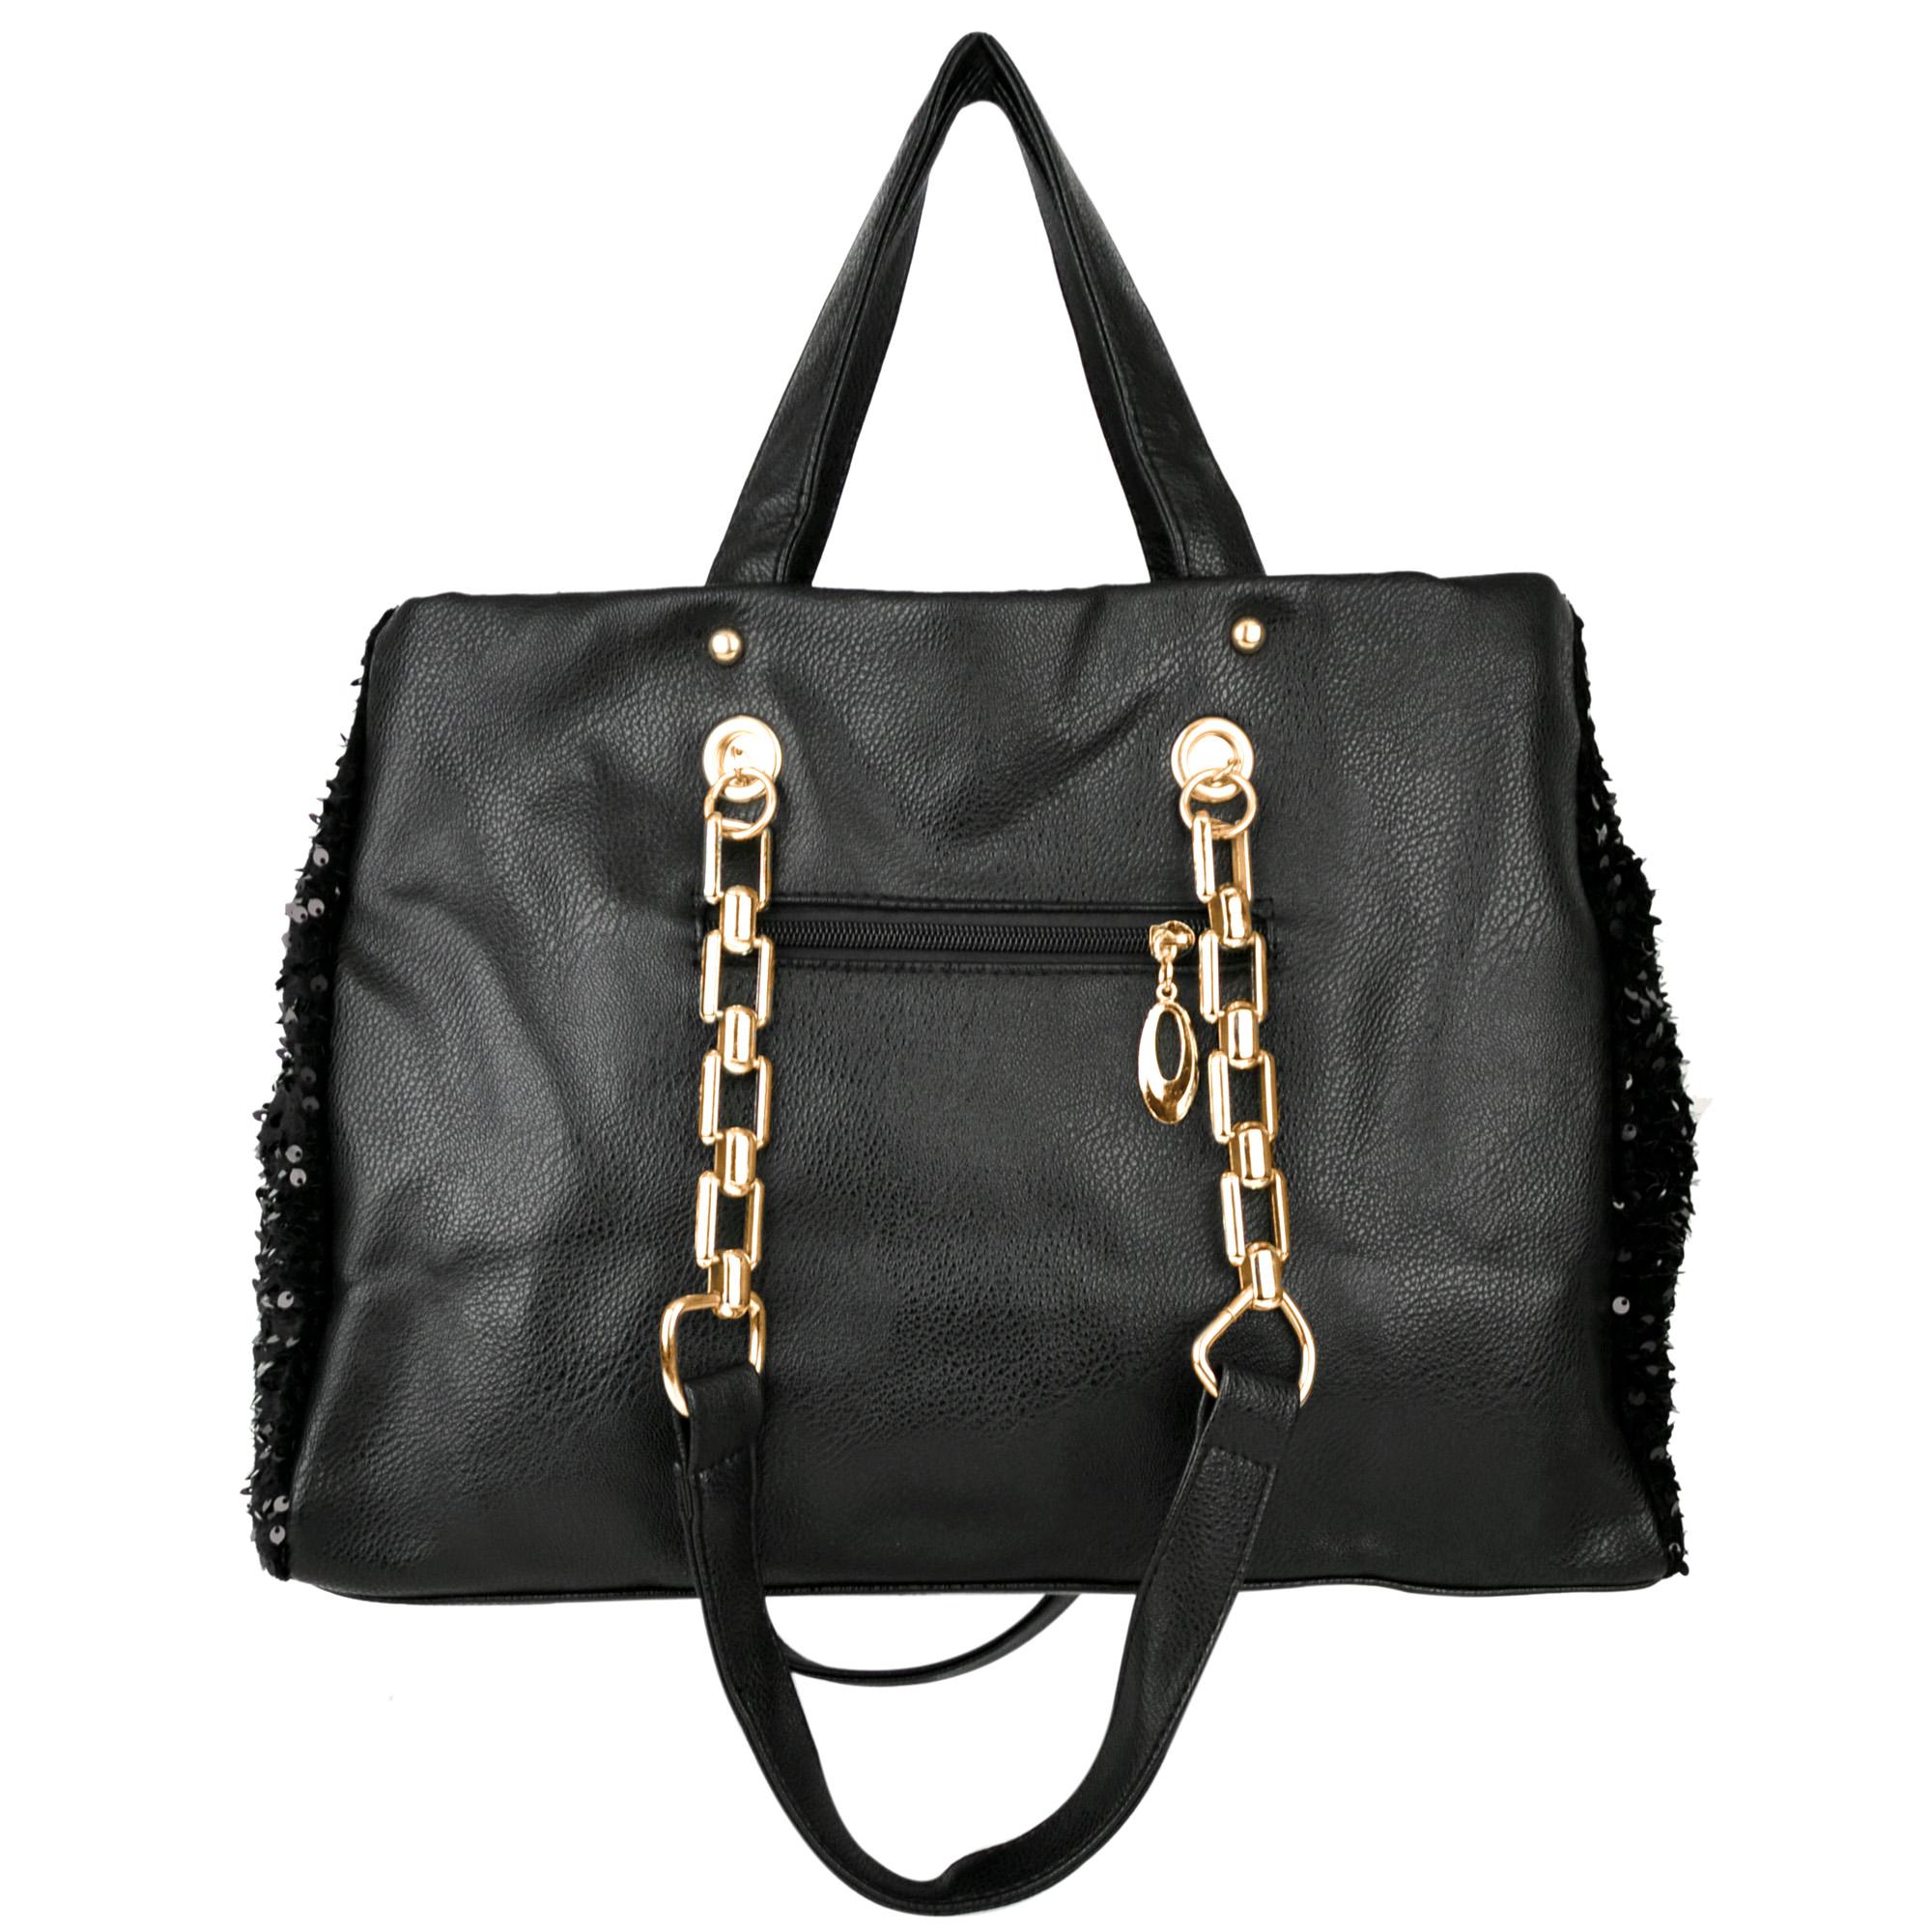 Noelia black sequined handbag back image